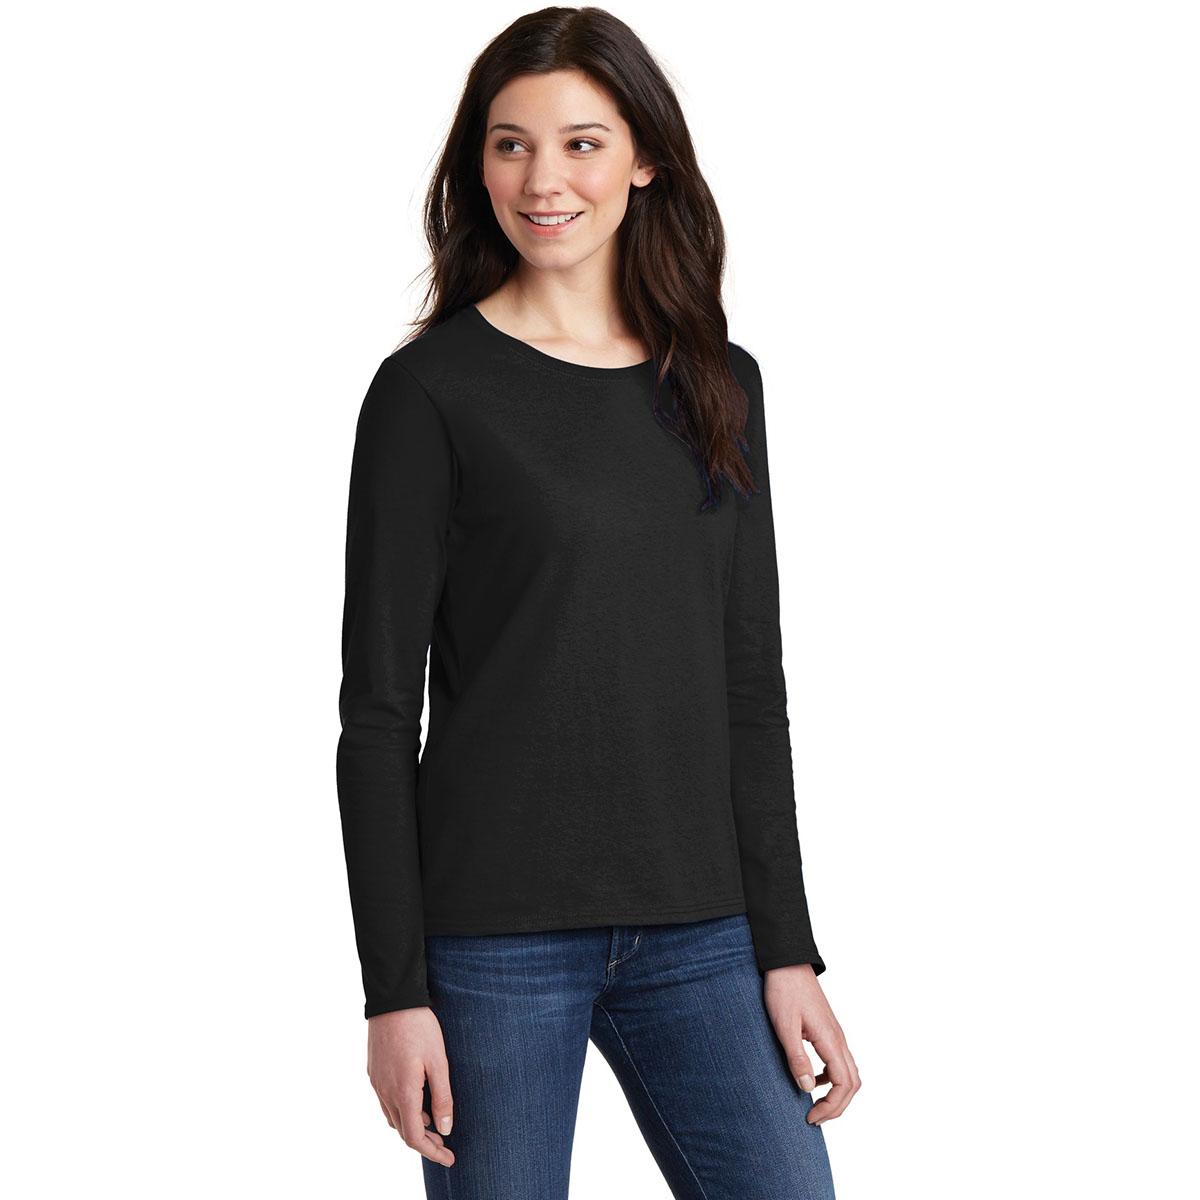 Gildan 5400l Ladies Heavy Cotton Long Sleeve T Shirt